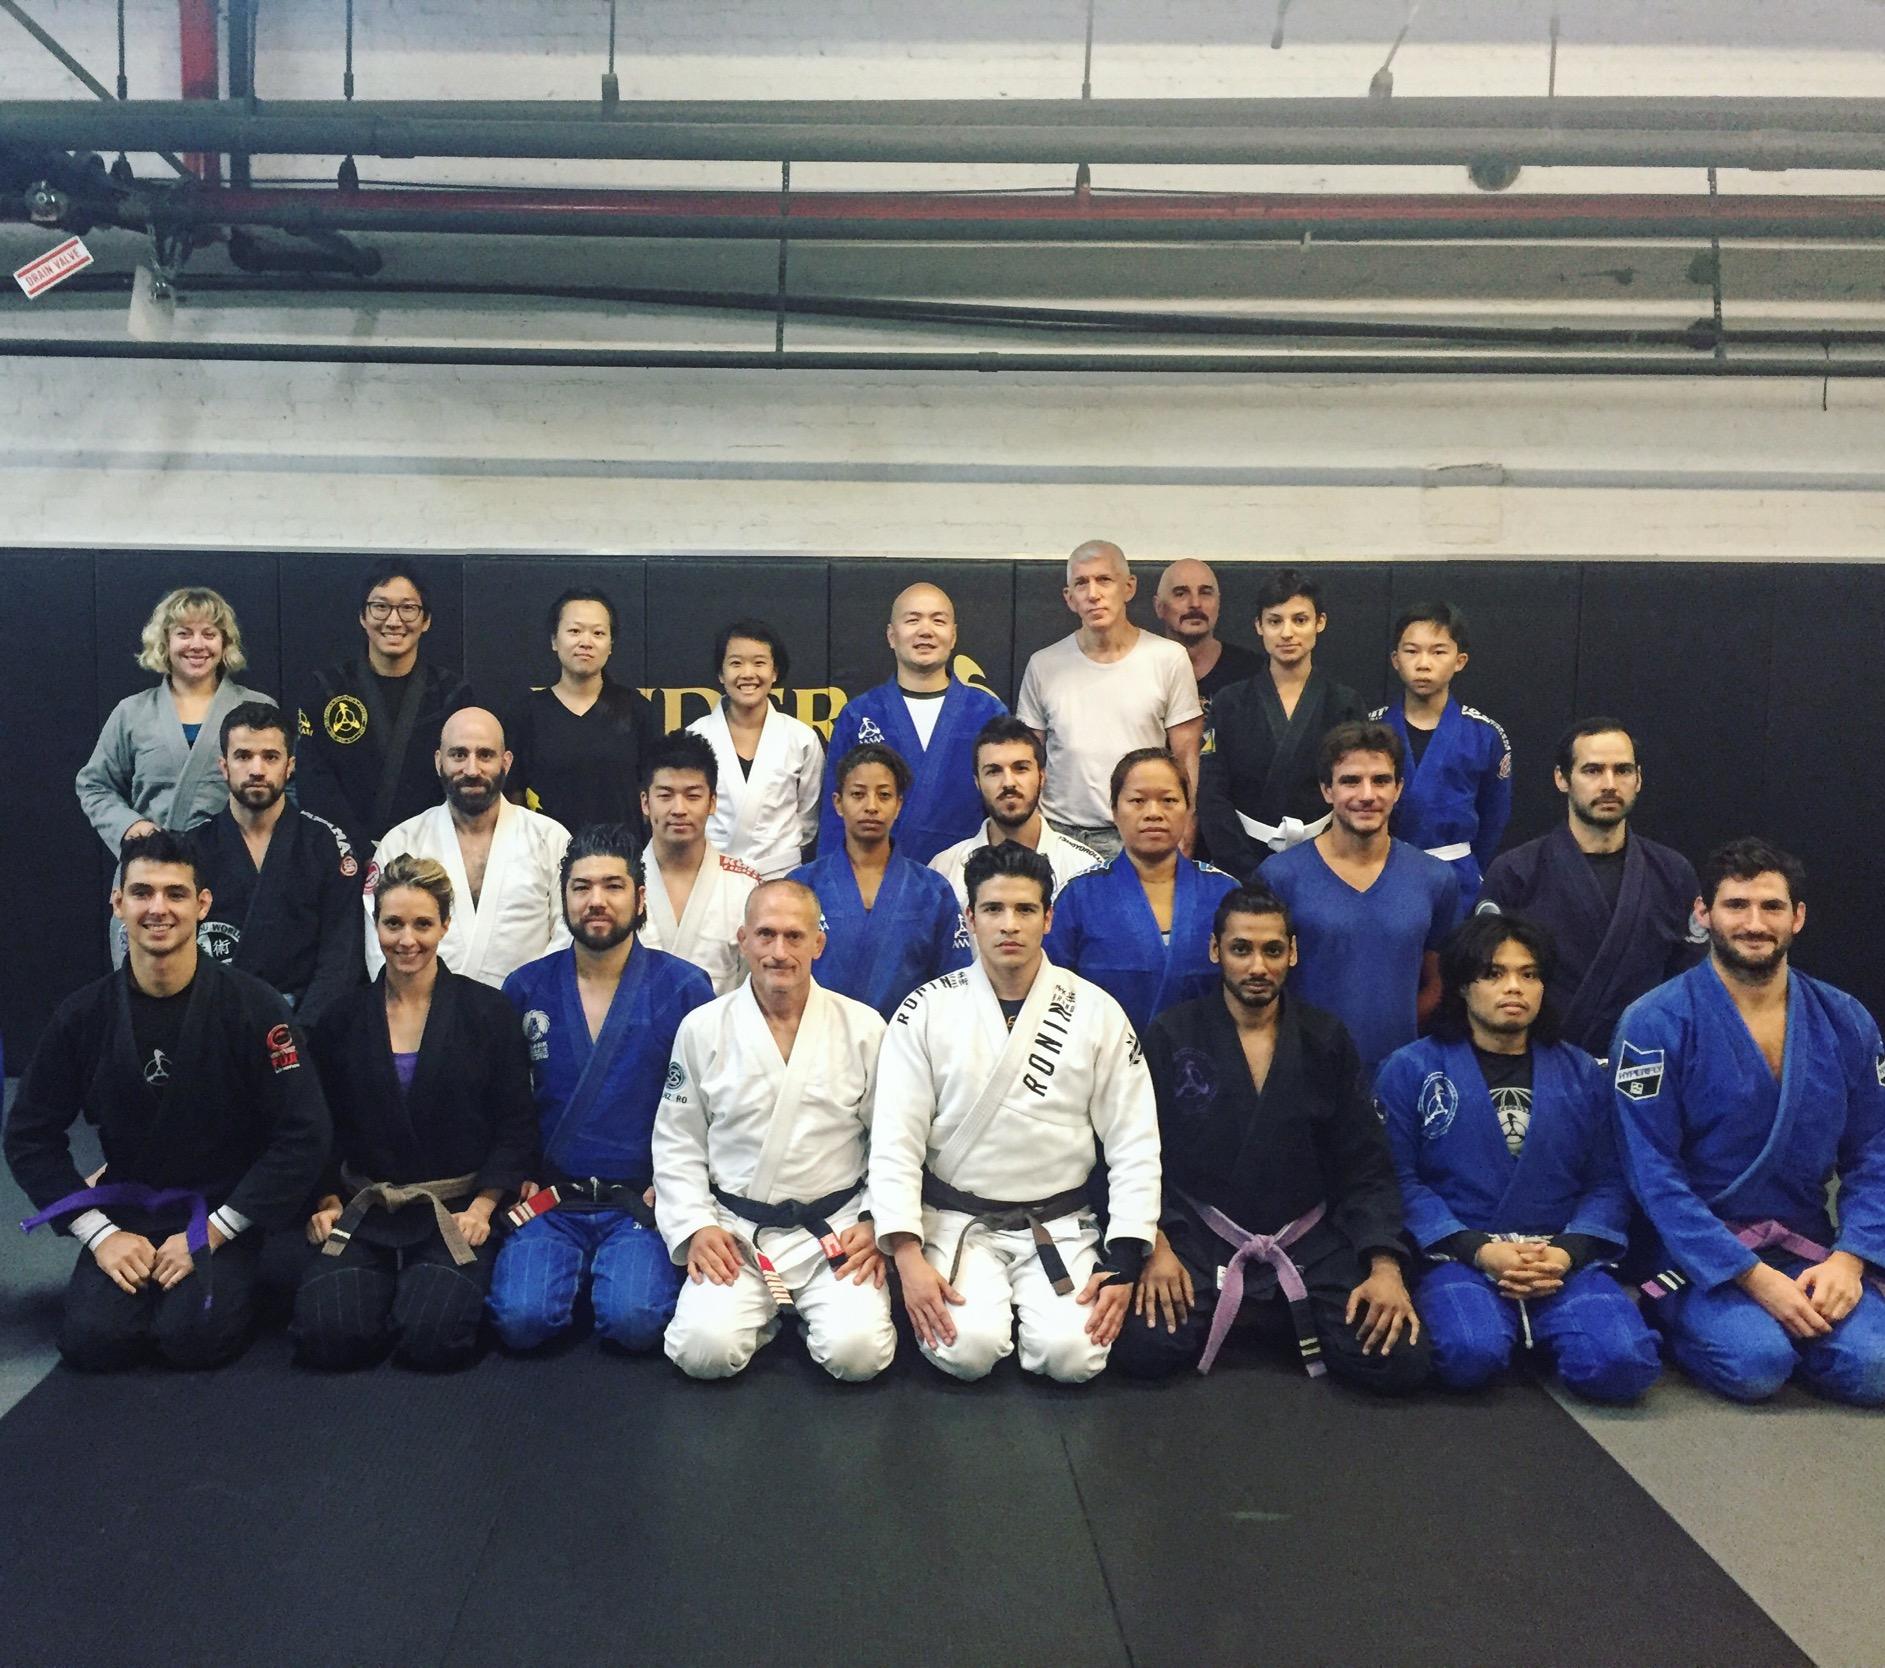 Steve Maxwell Teaches a Gracie JiuJitsu Workshop at Andersons Martial Arts NYC